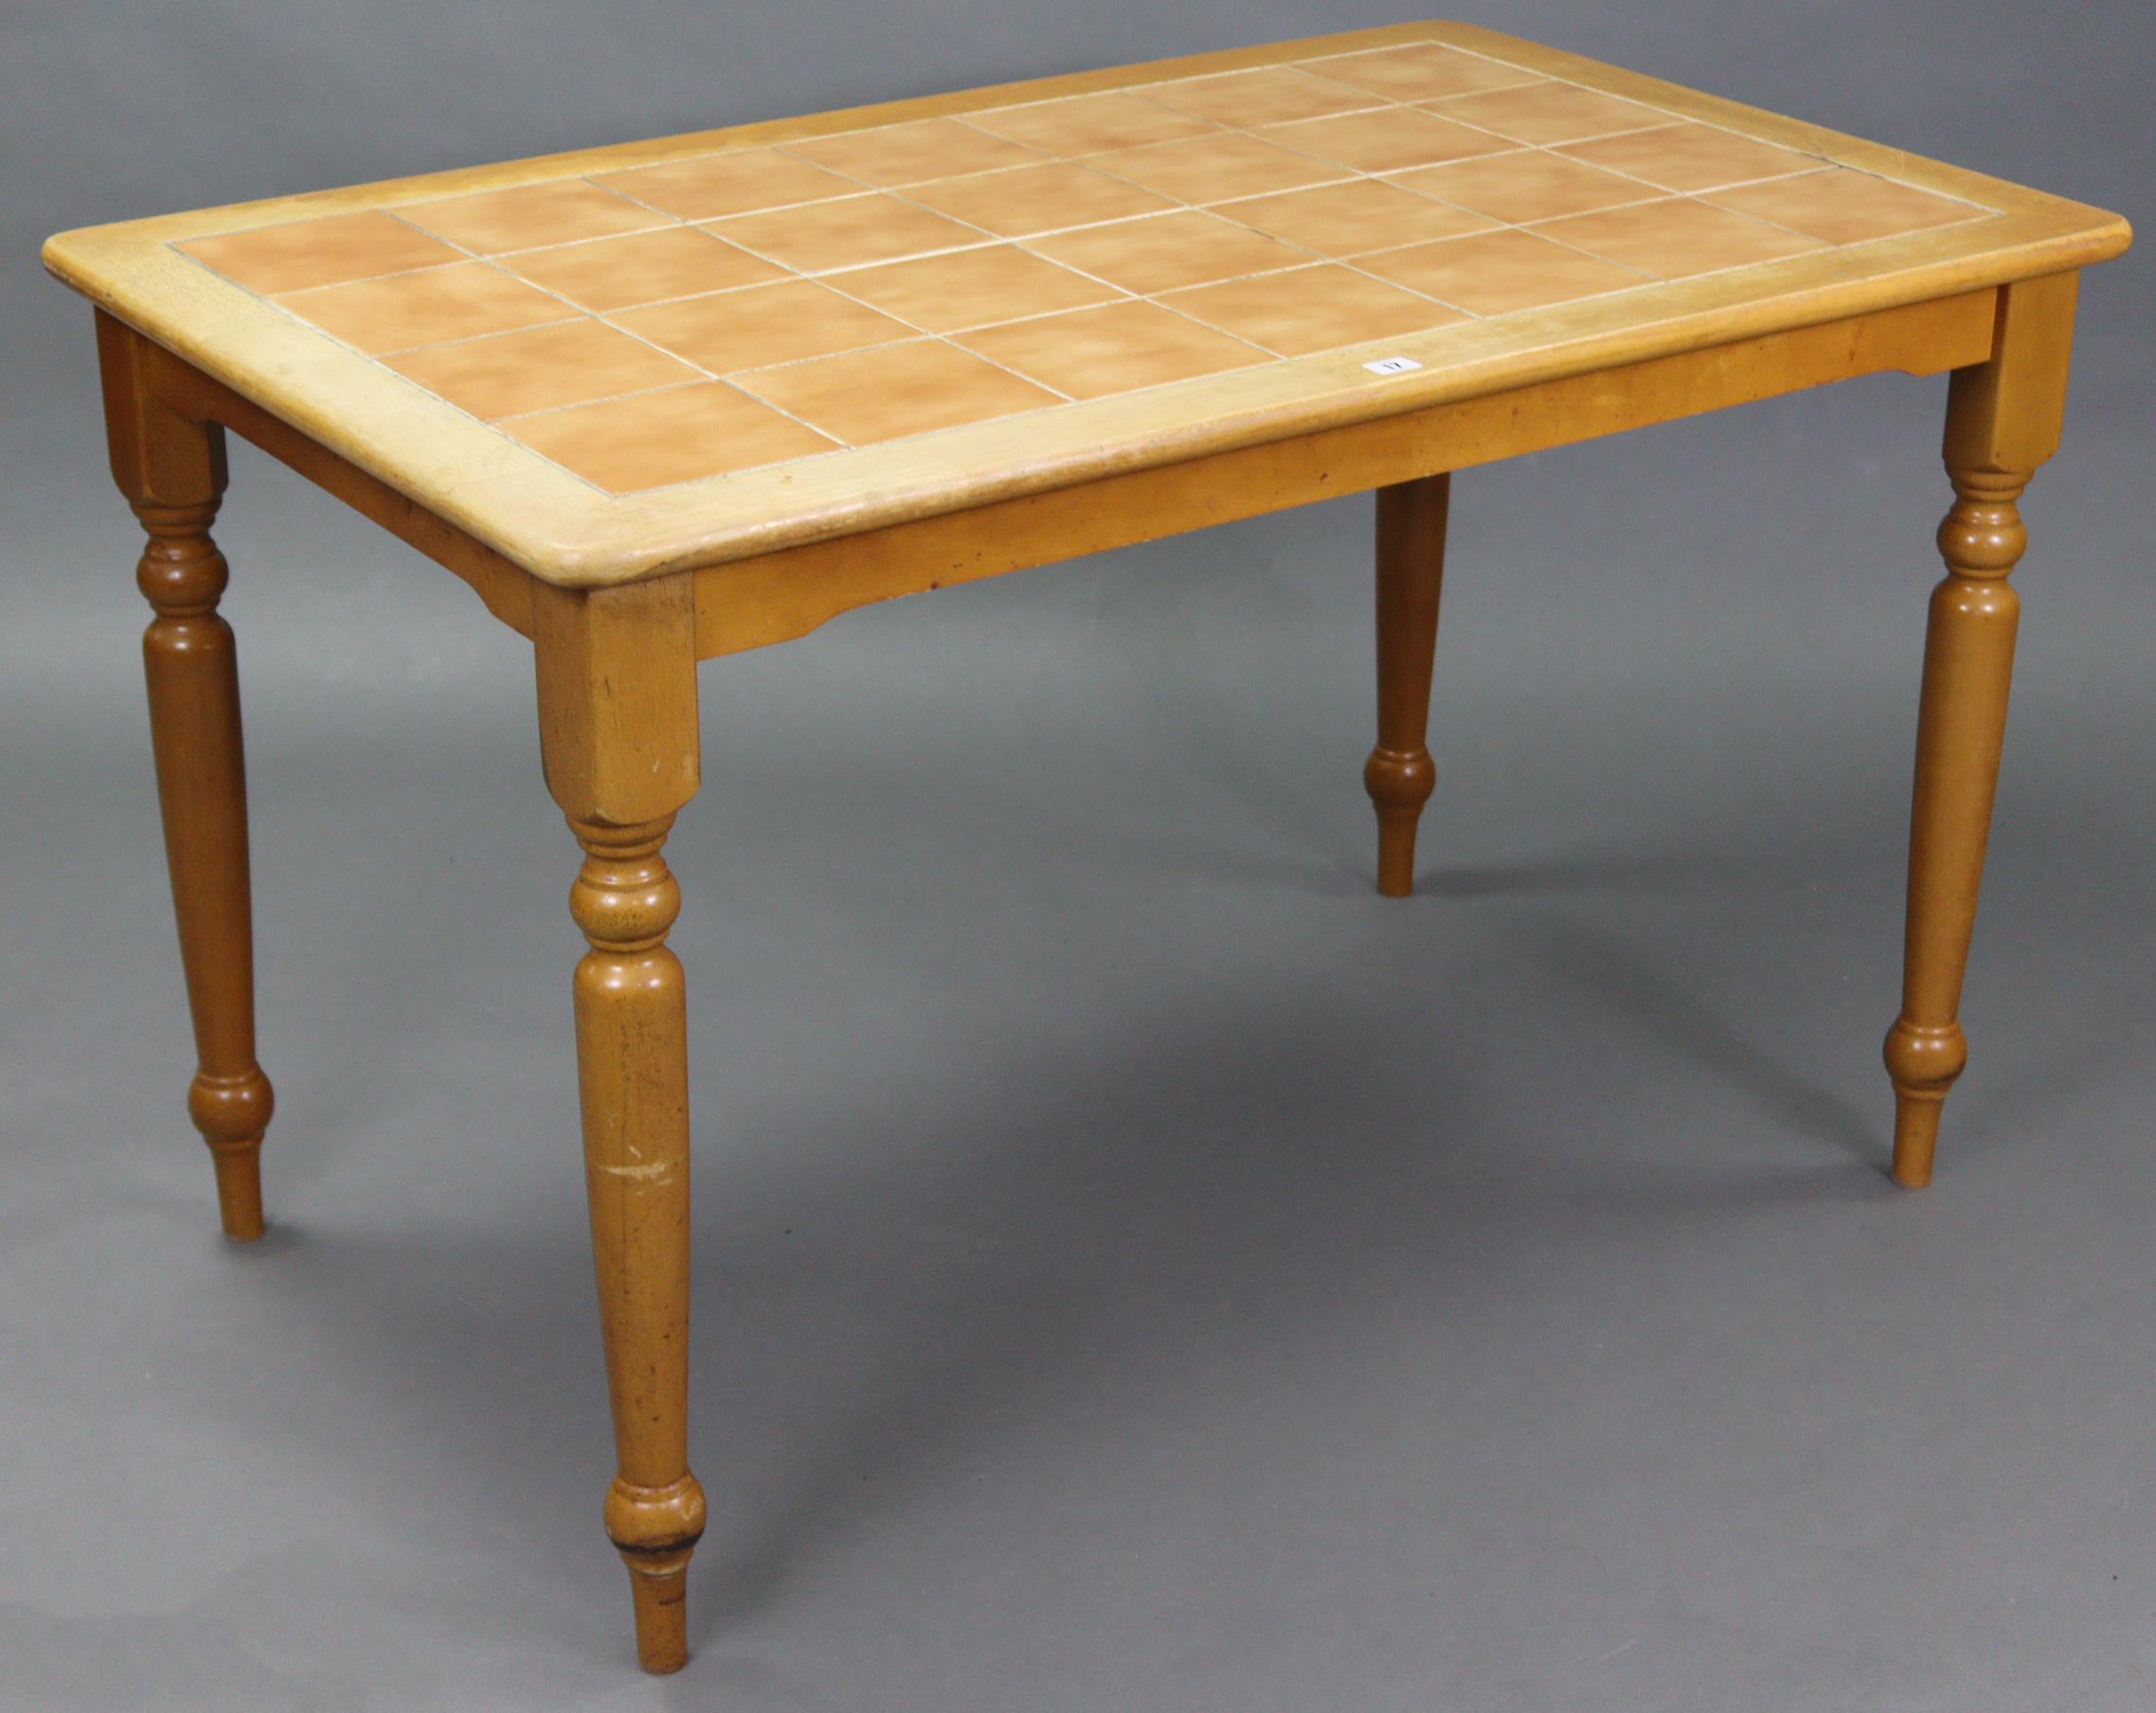 "A beech rectangular tile-top kitchen table on four turned legs, 47"" wide x 29½"" high x 29½"" deep."